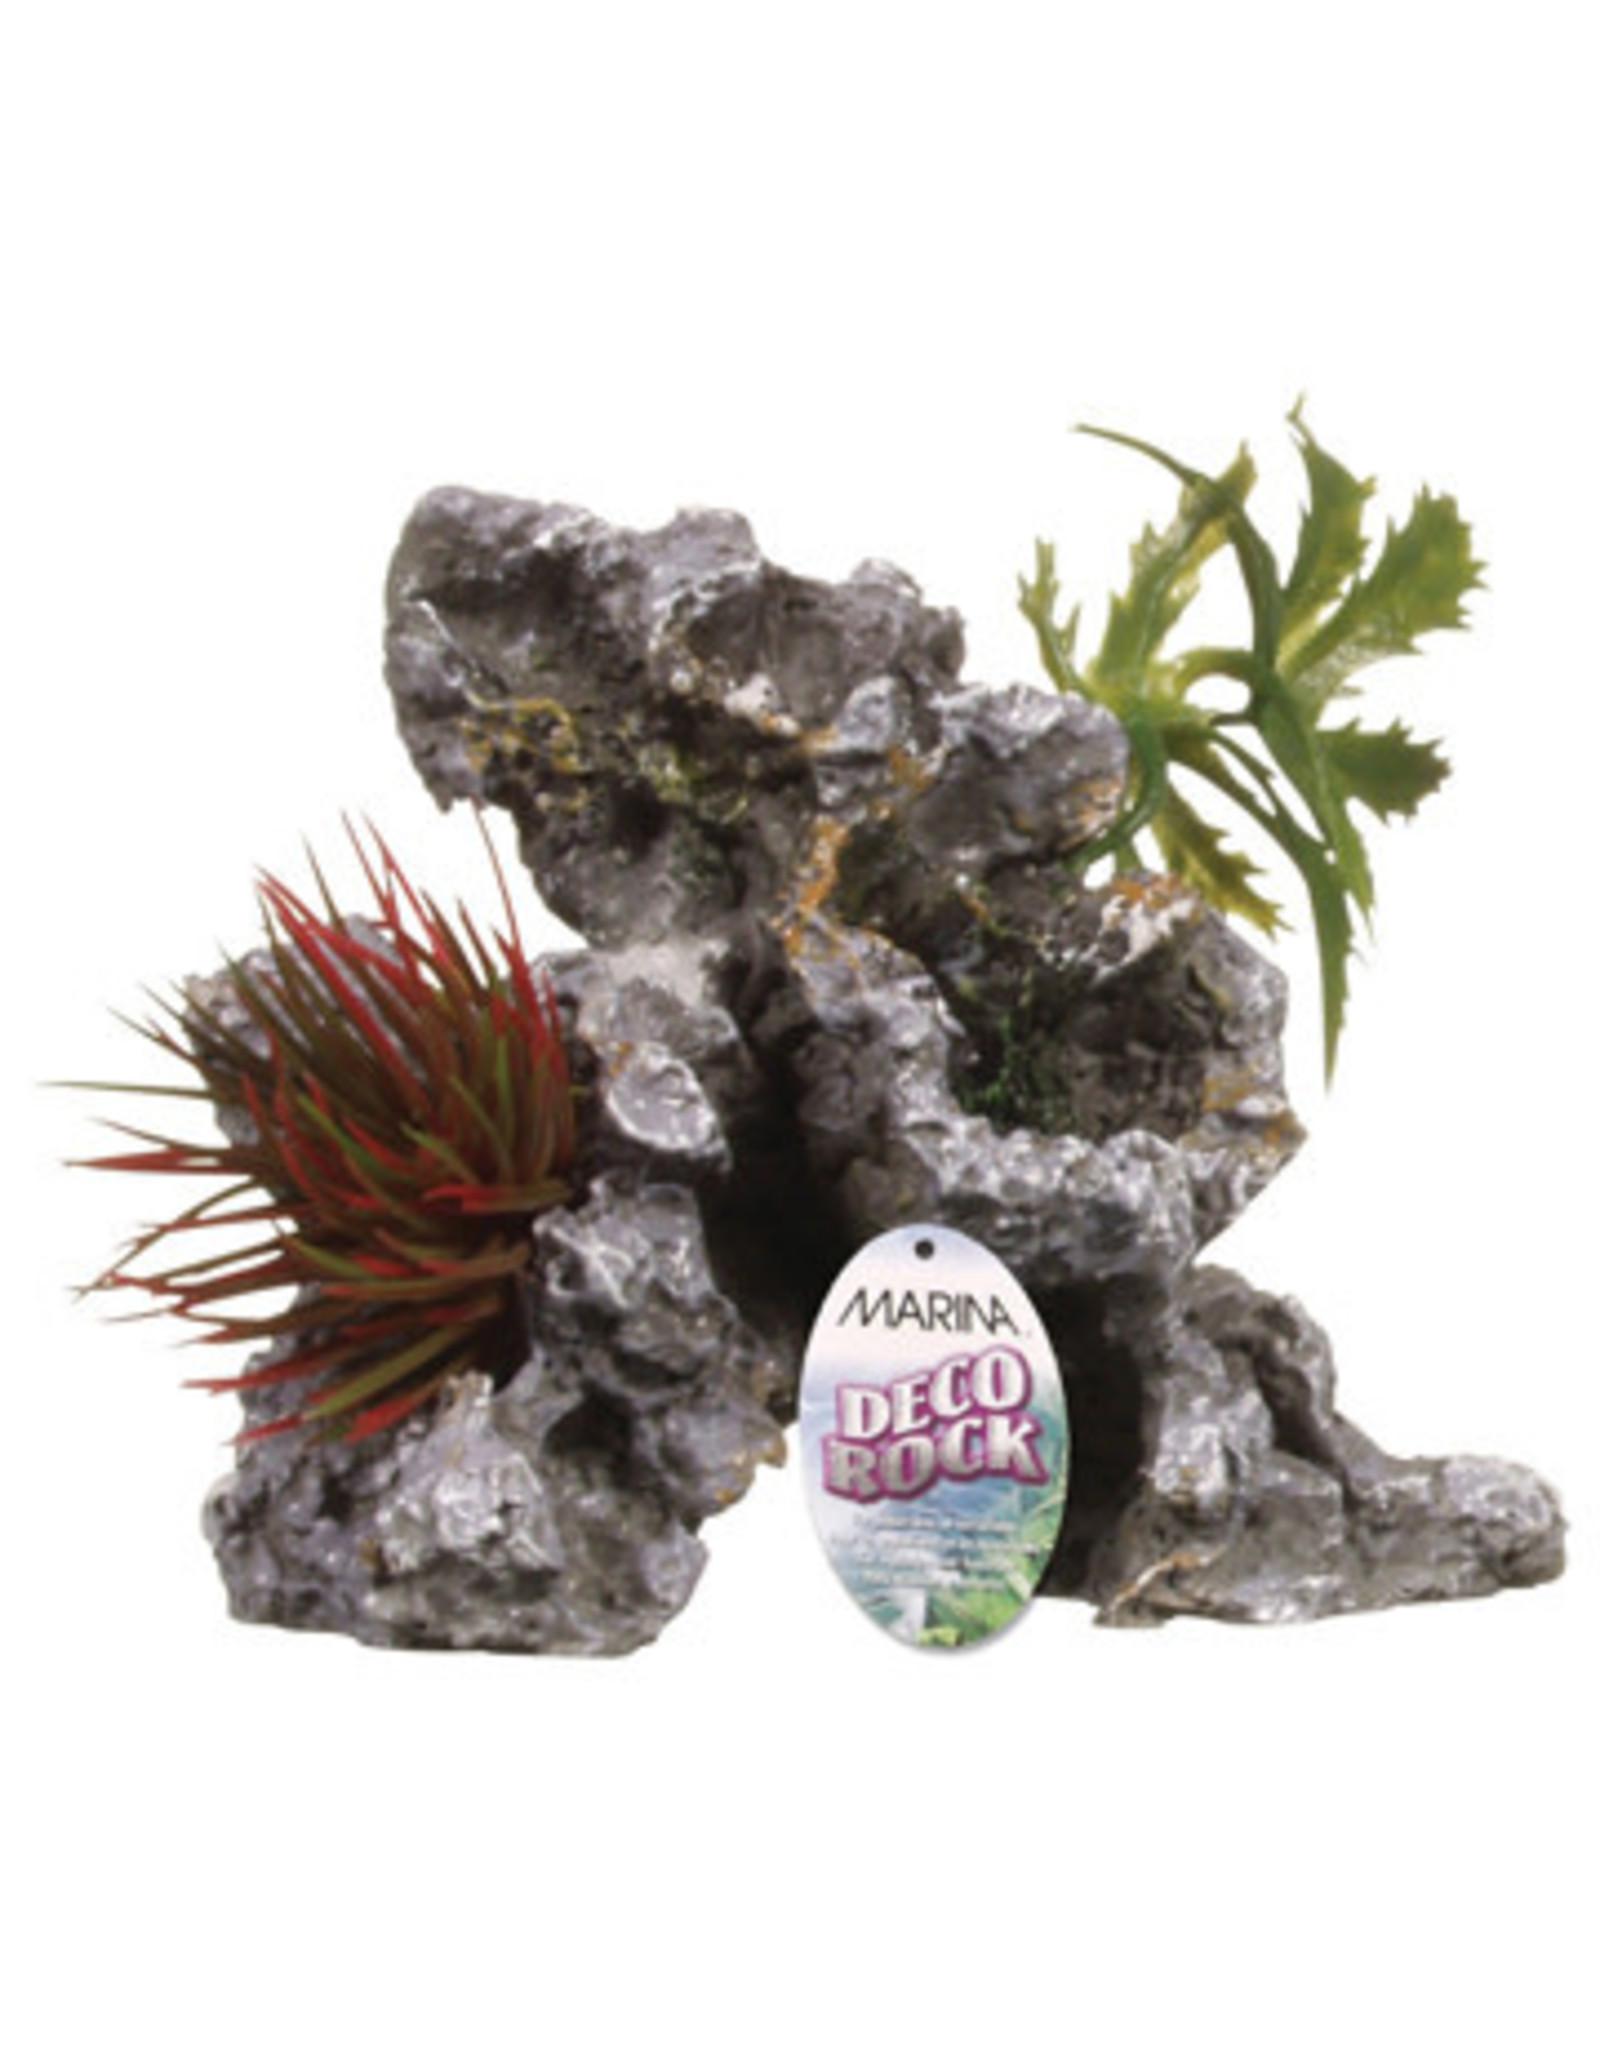 Marina Marina Deco-Rock Ornament - Small